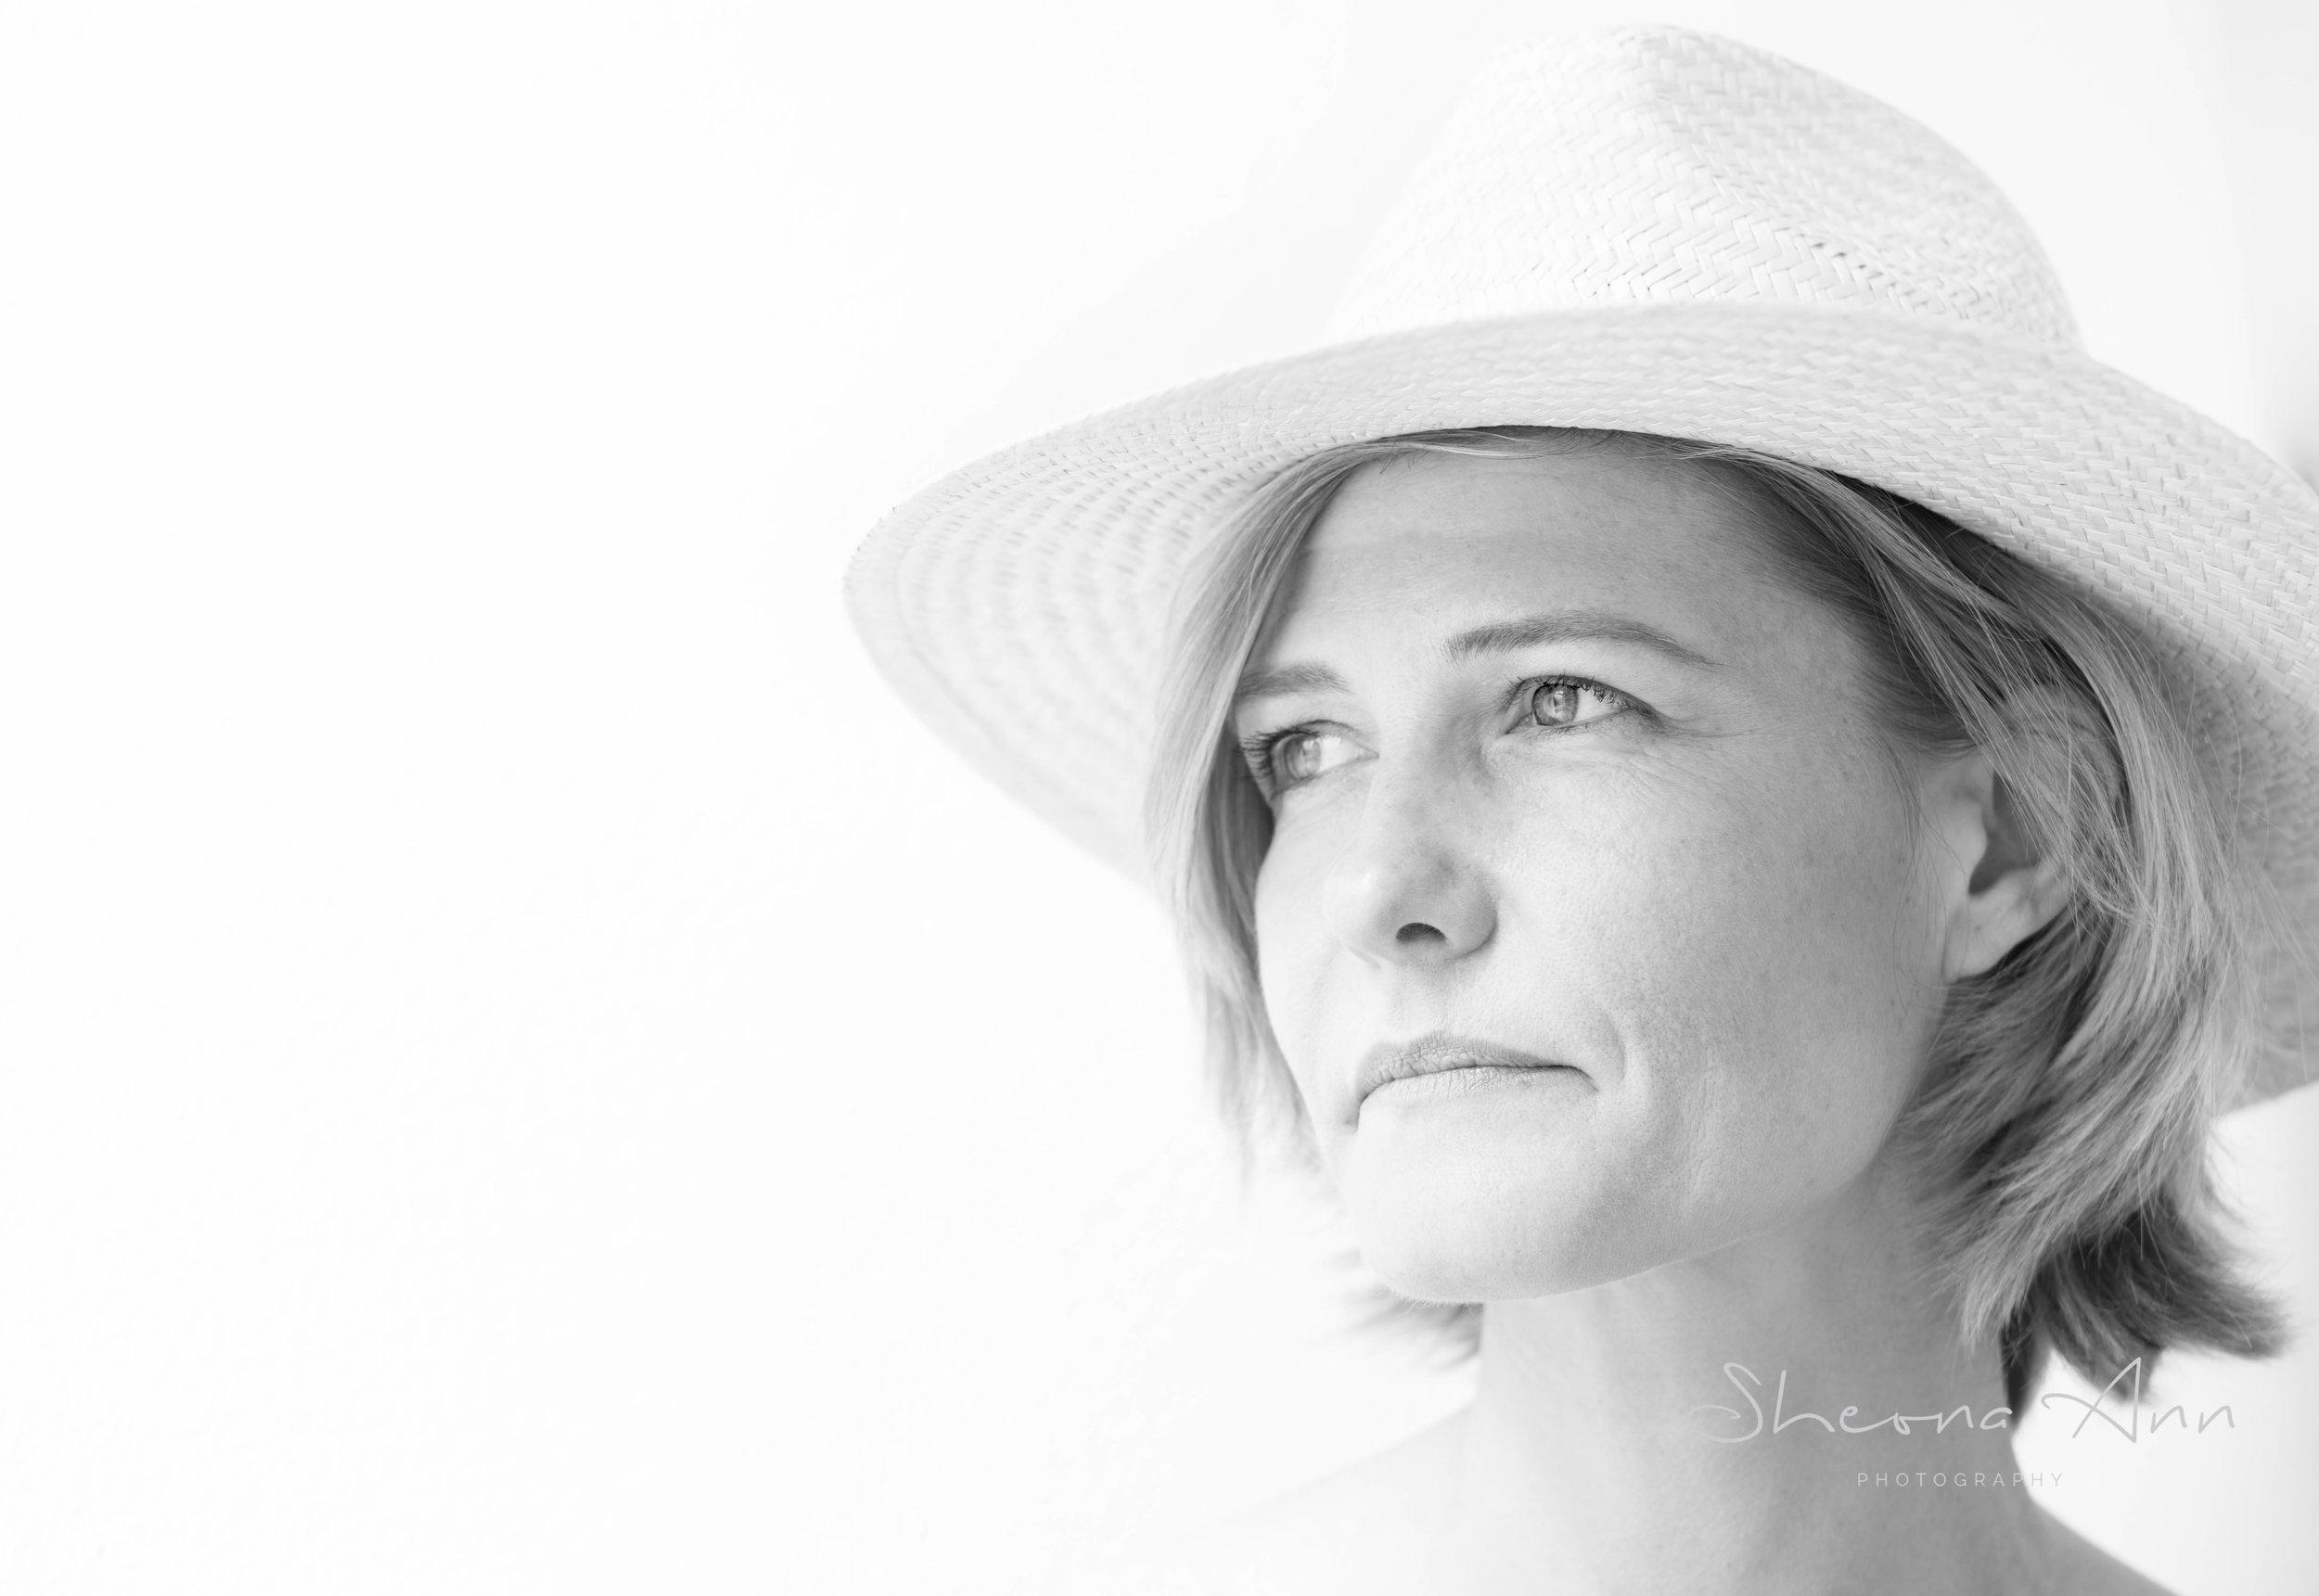 pretty-woman-hat-bw-portrait-highkey-Sheona-Ann-Photography (1 of 1).jpg